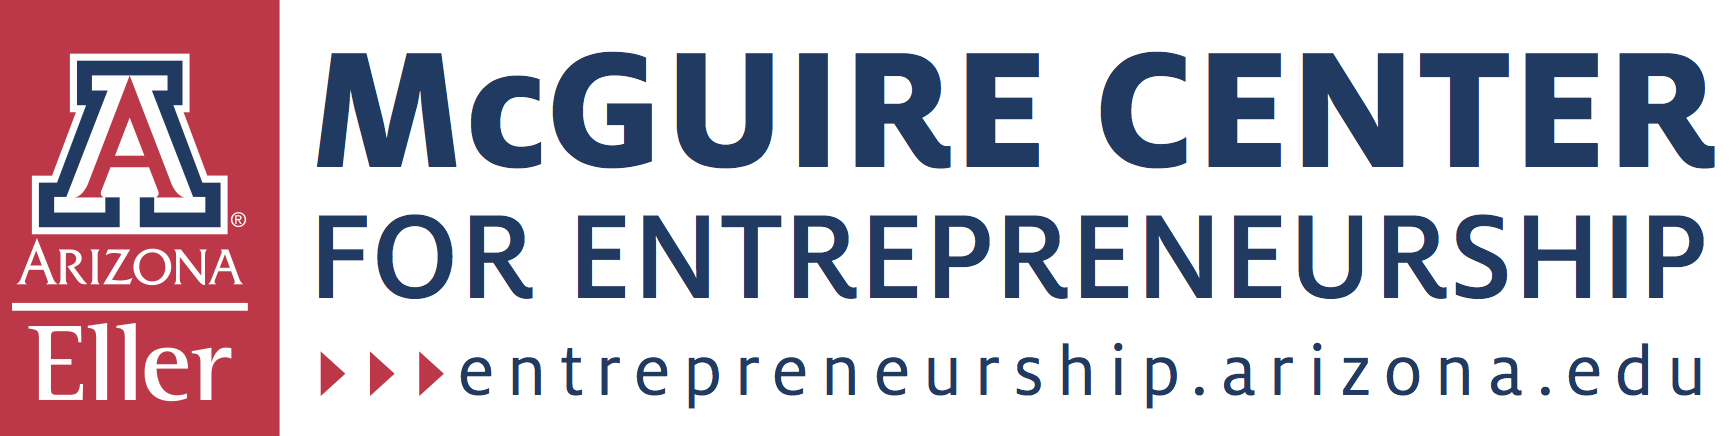 McGuire Center for Entrepreneurship Logo